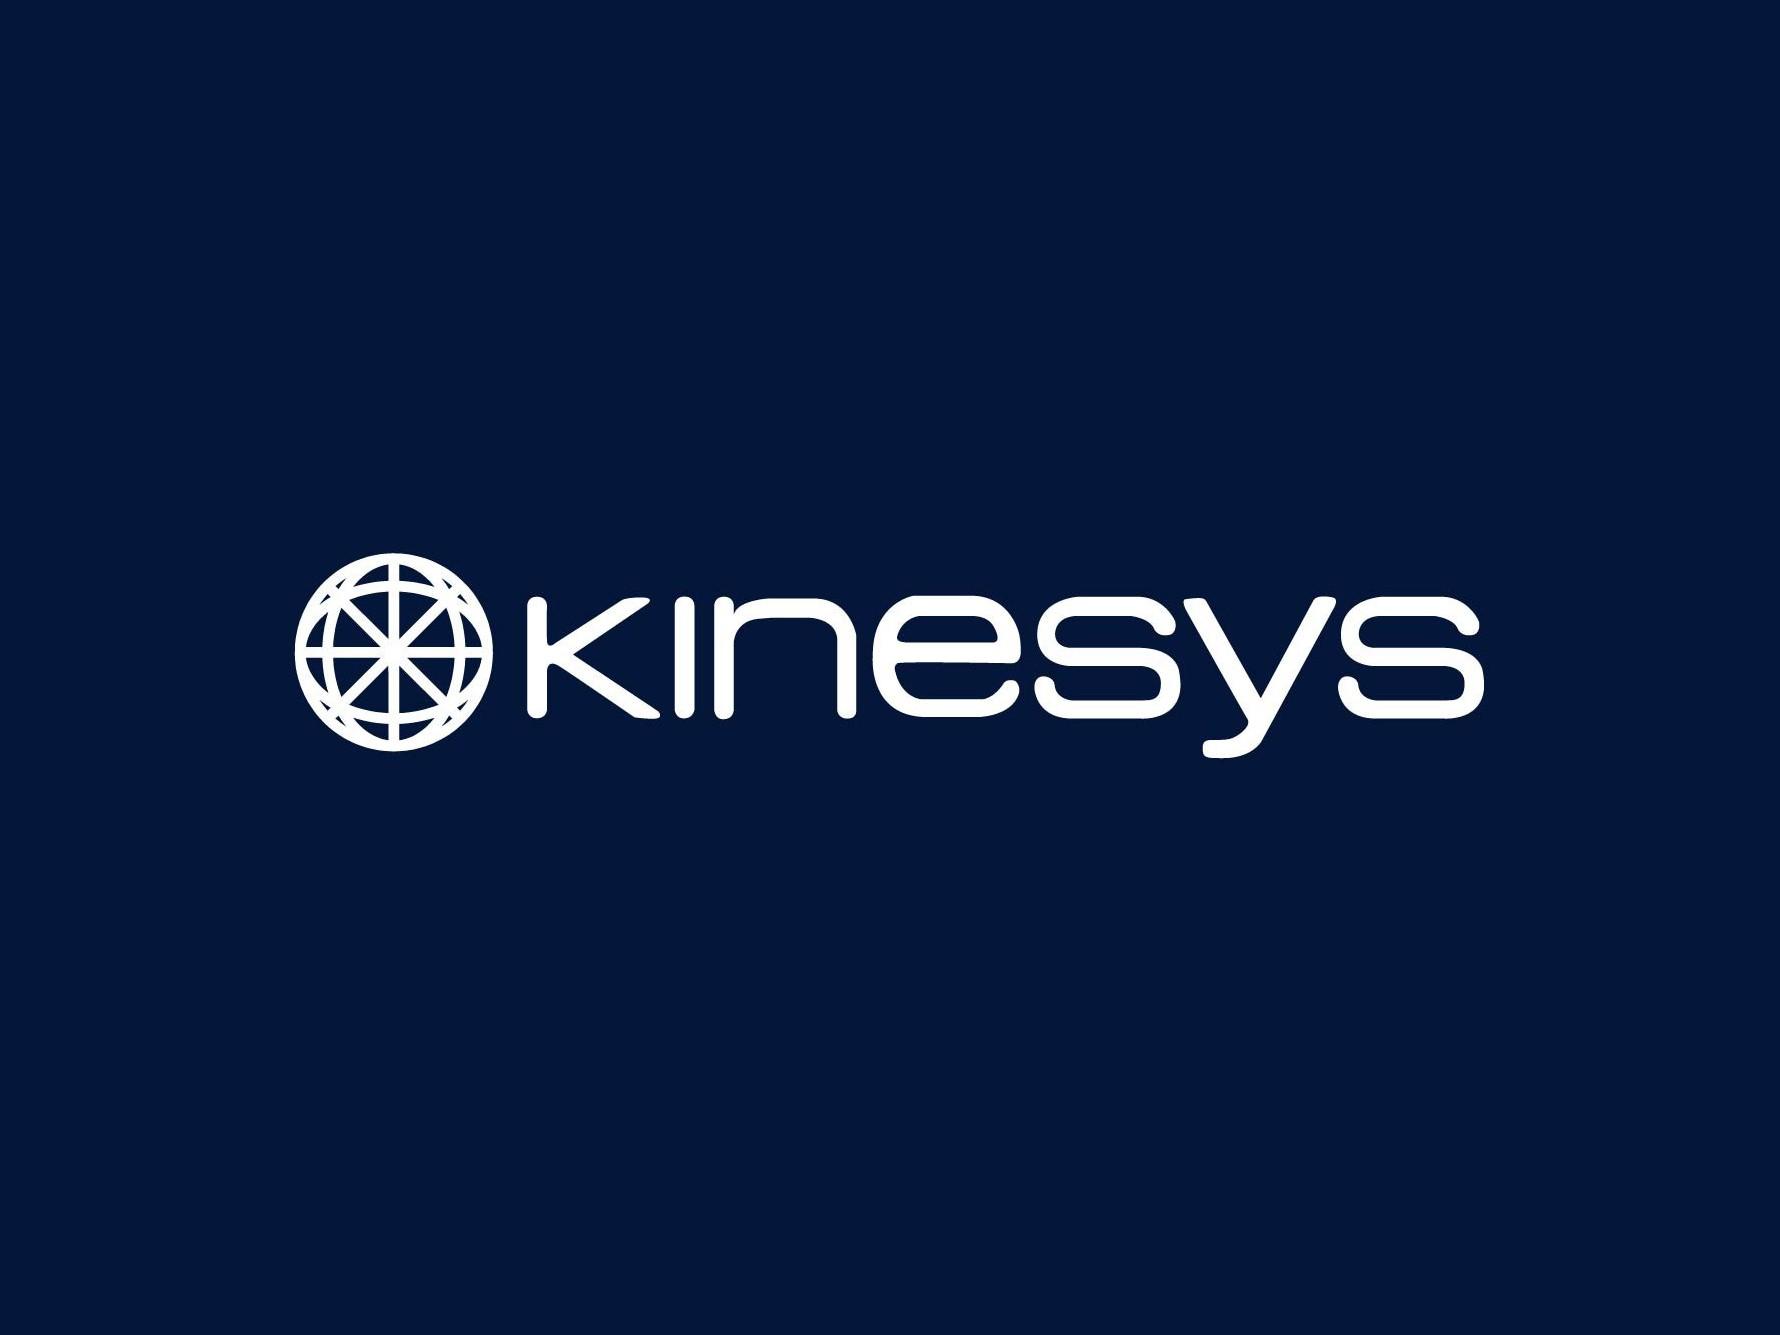 Kinesys-logo-01.jpg